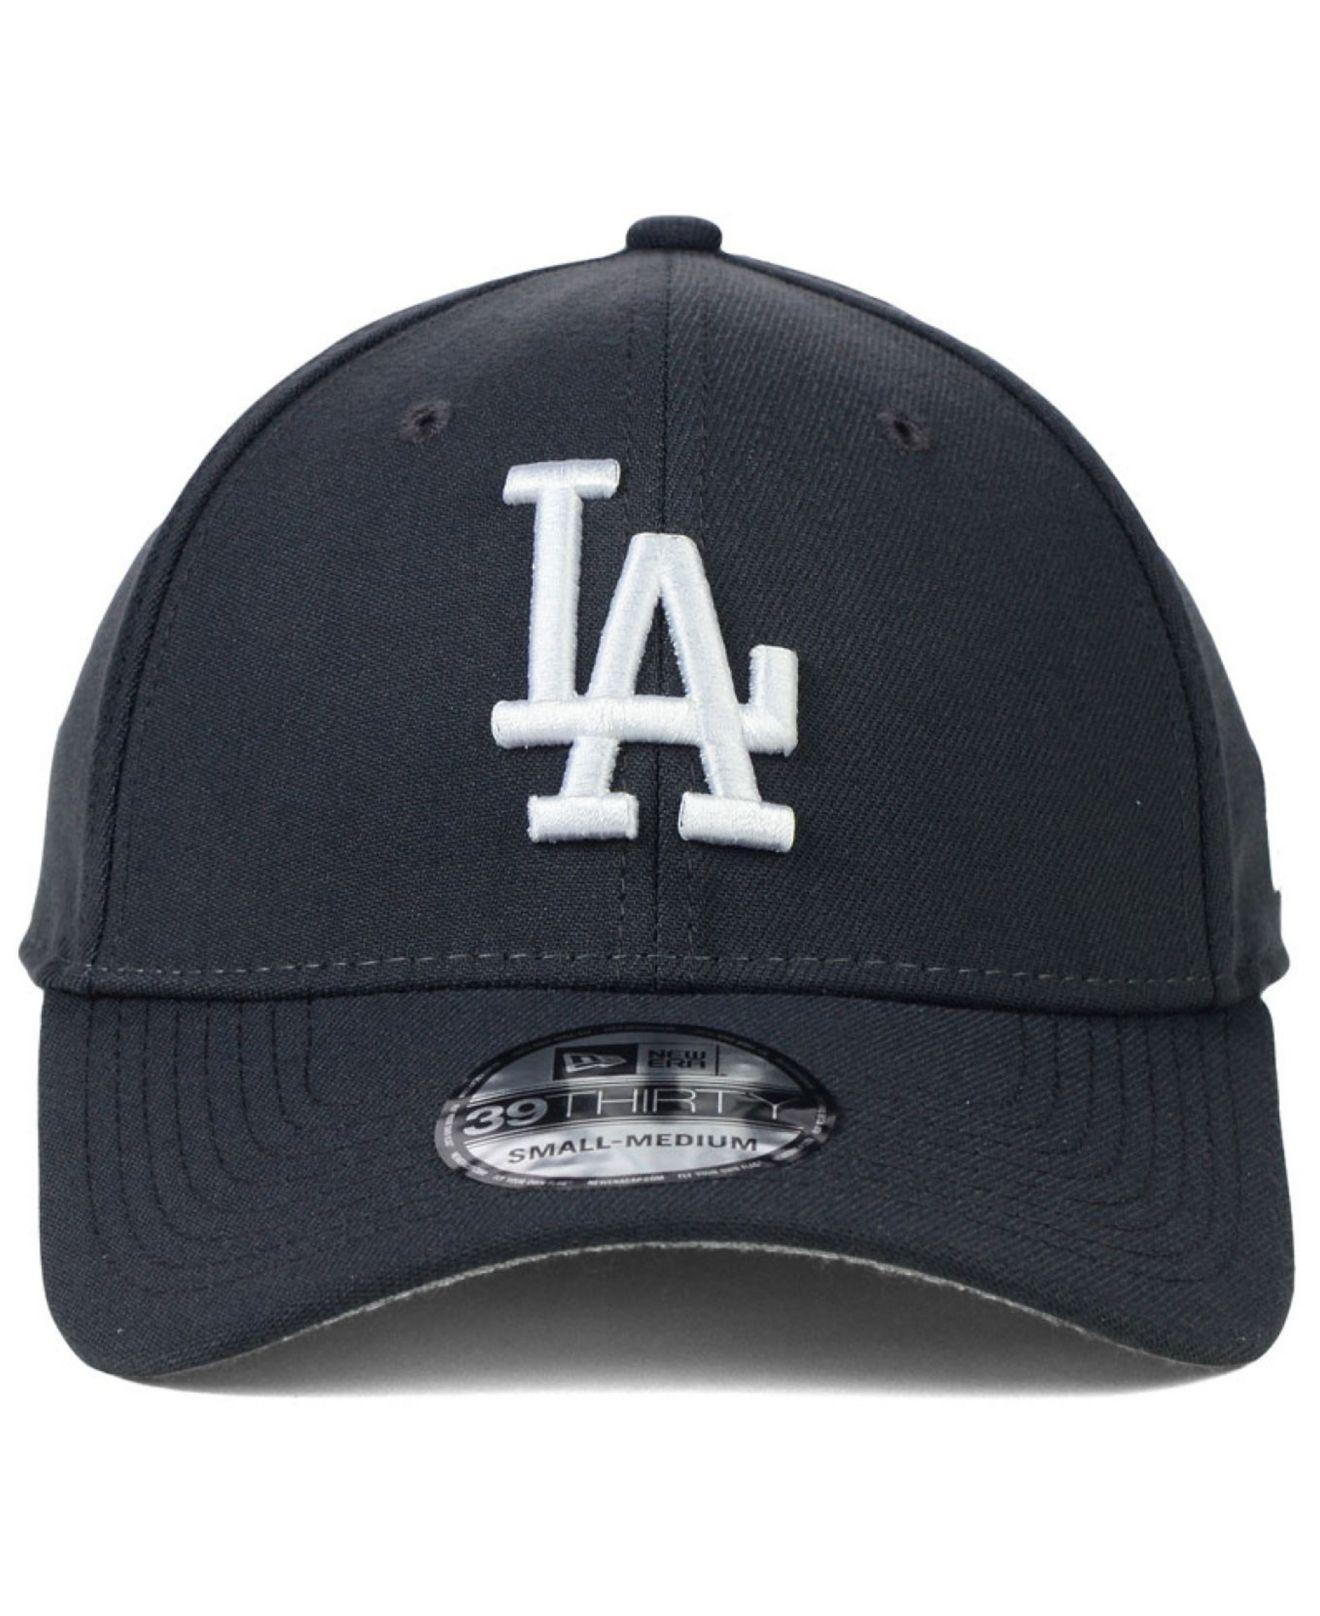 38af7b8f5808f9 KTZ Los Angeles Dodgers Fashion 39thirty Cap in Gray for Men - Lyst